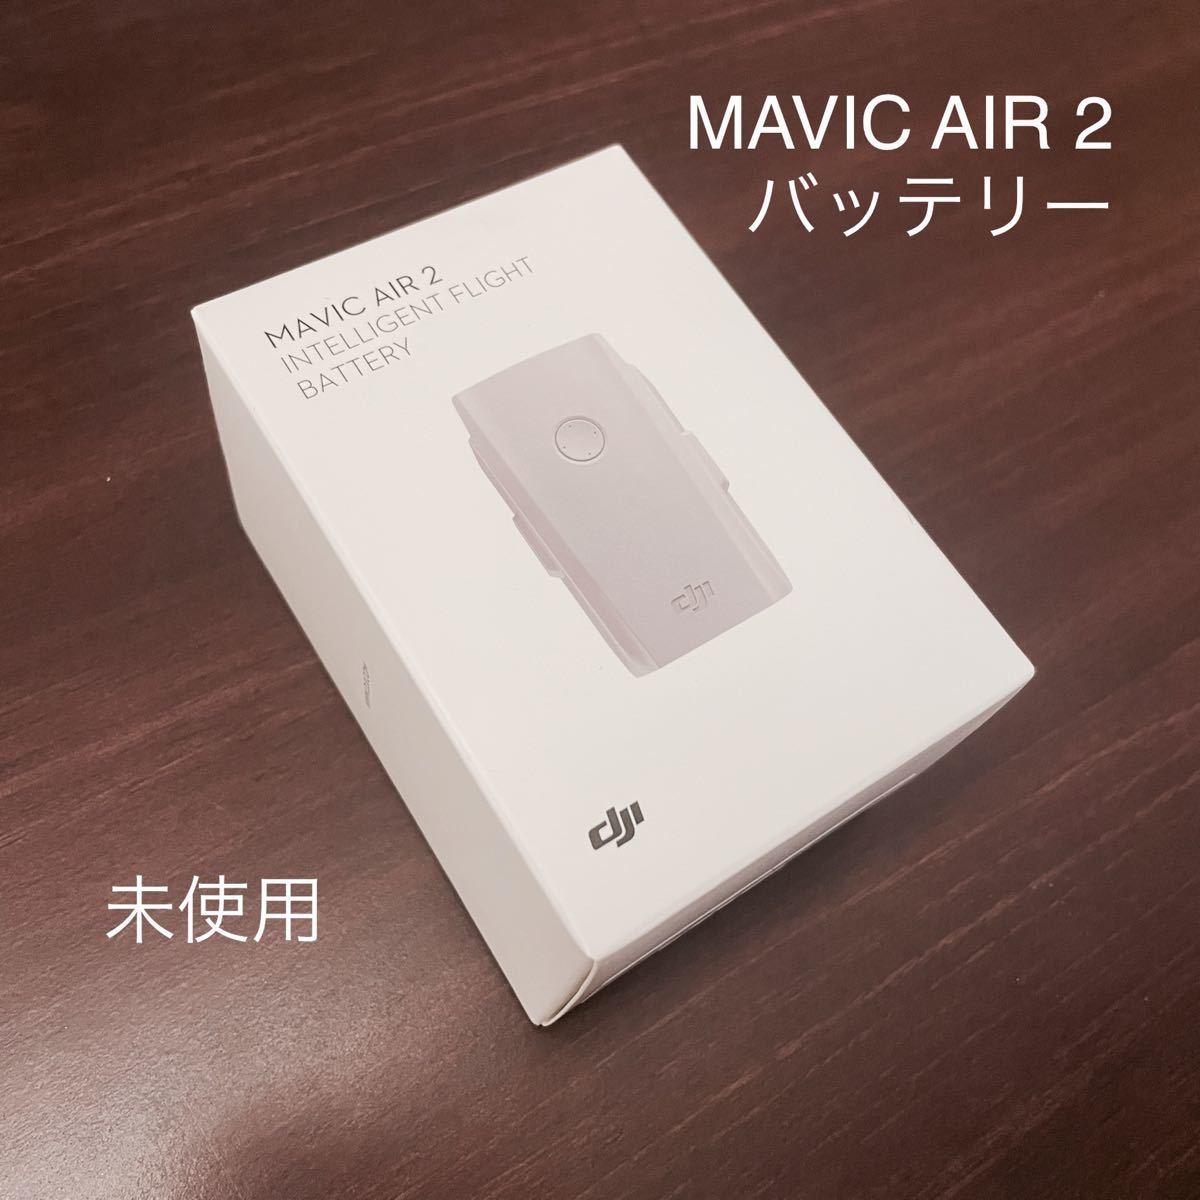 DJI Mavic Air2 / 2S Intelligent Flight Battery 純正バッテリー【未使用・国内正規品】